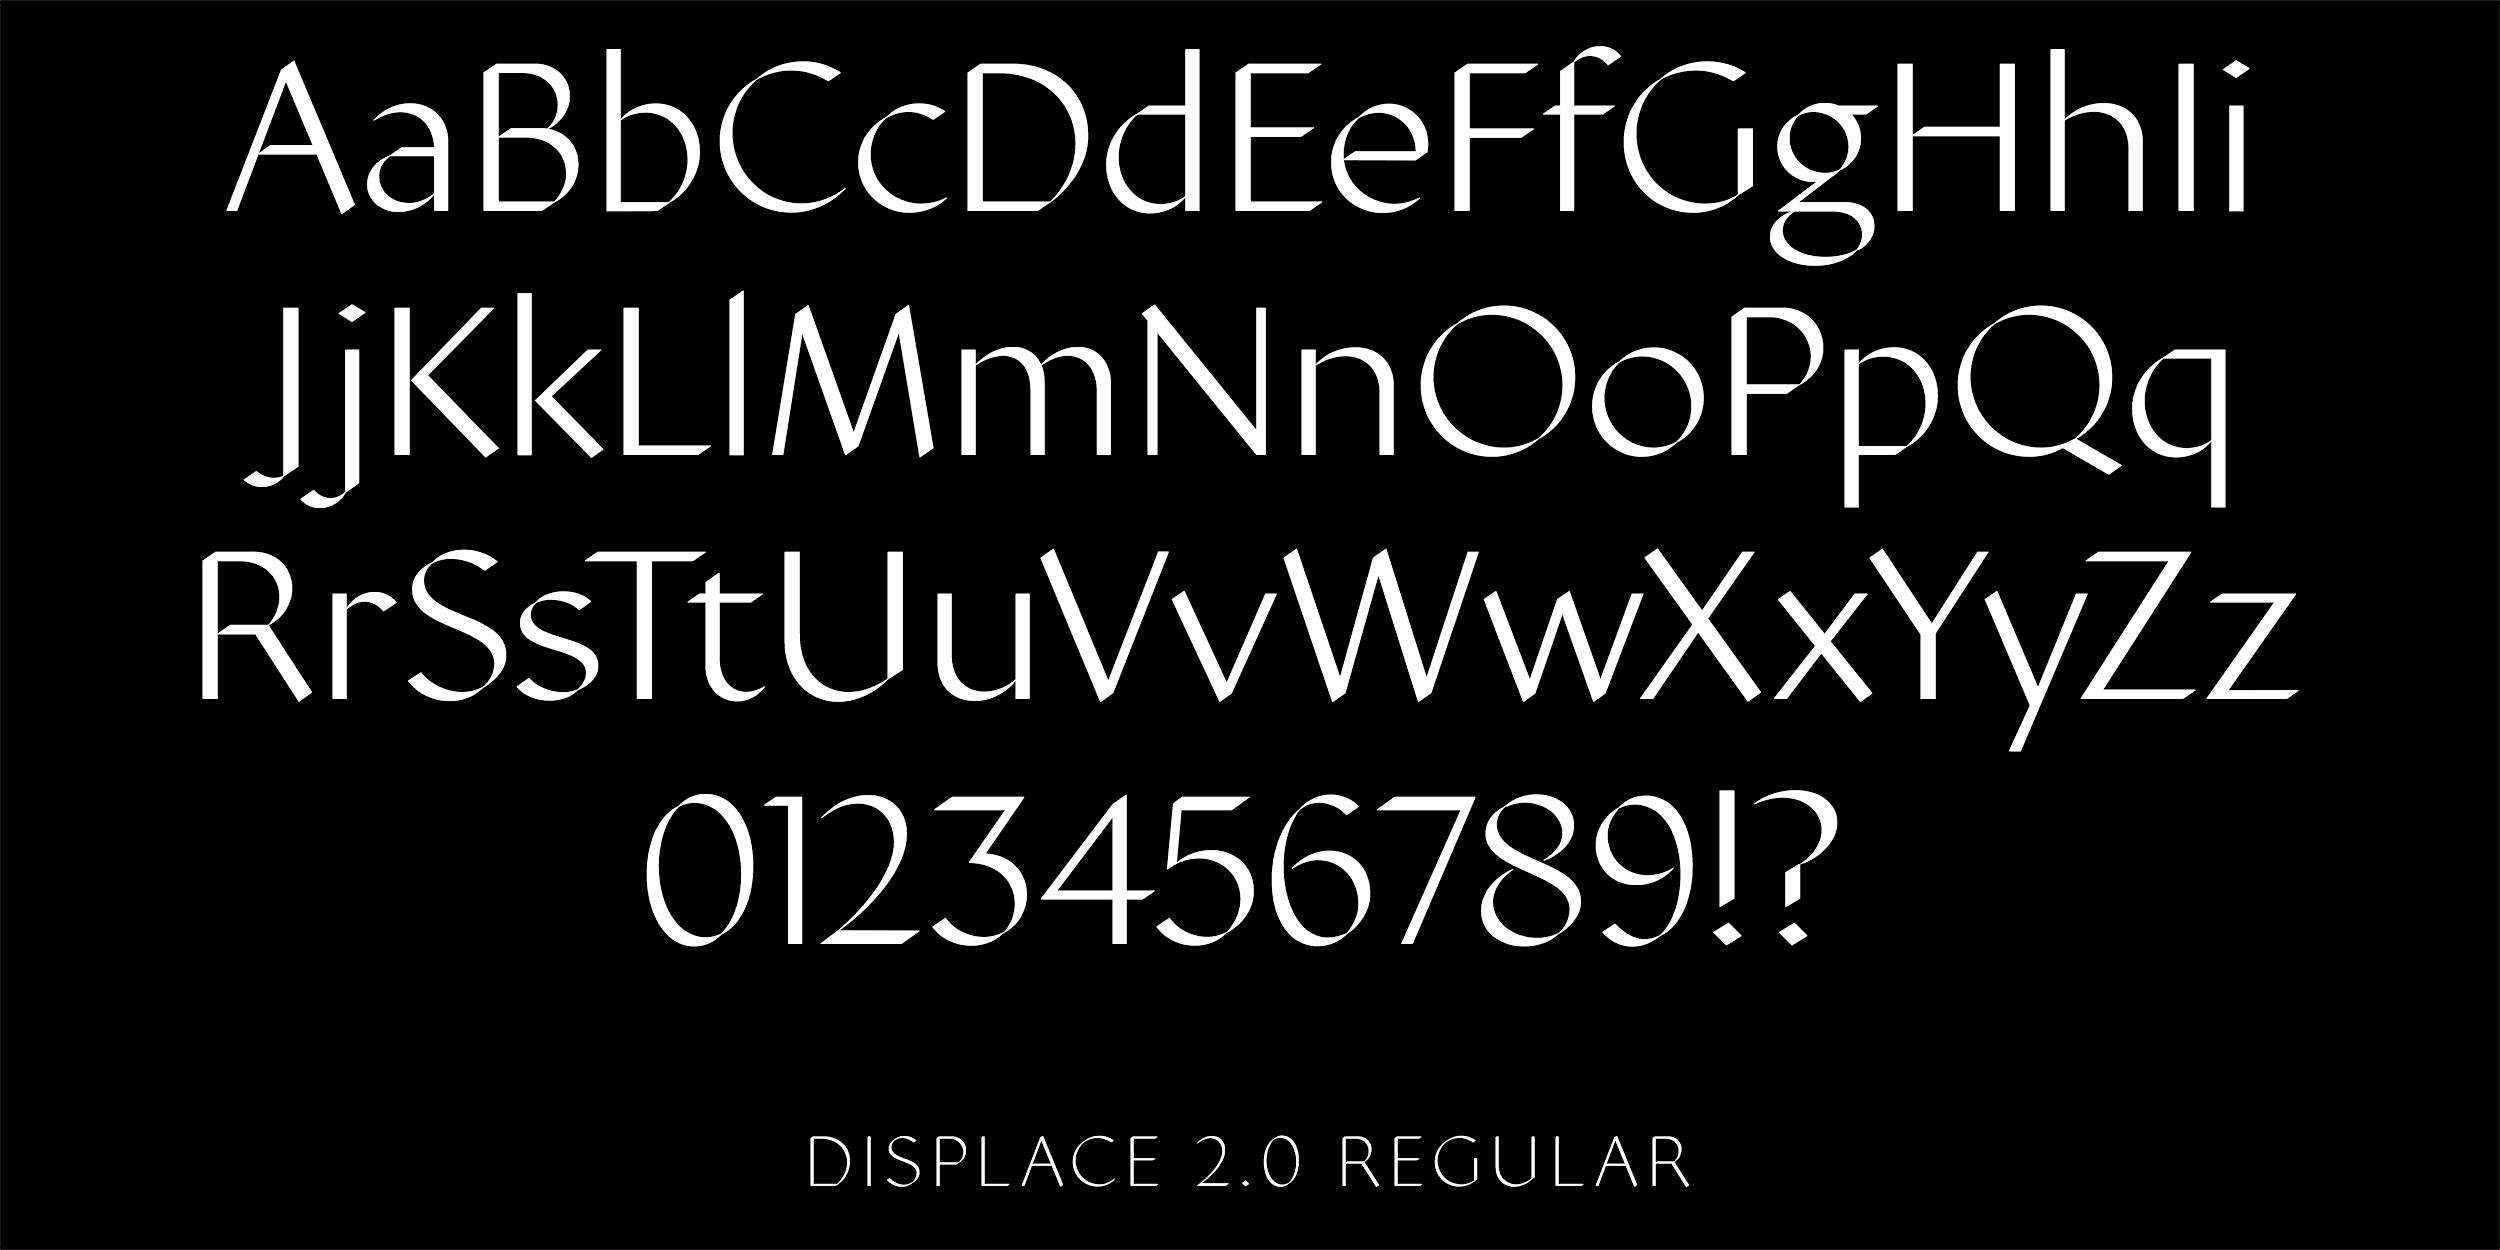 displace2.0_full_03